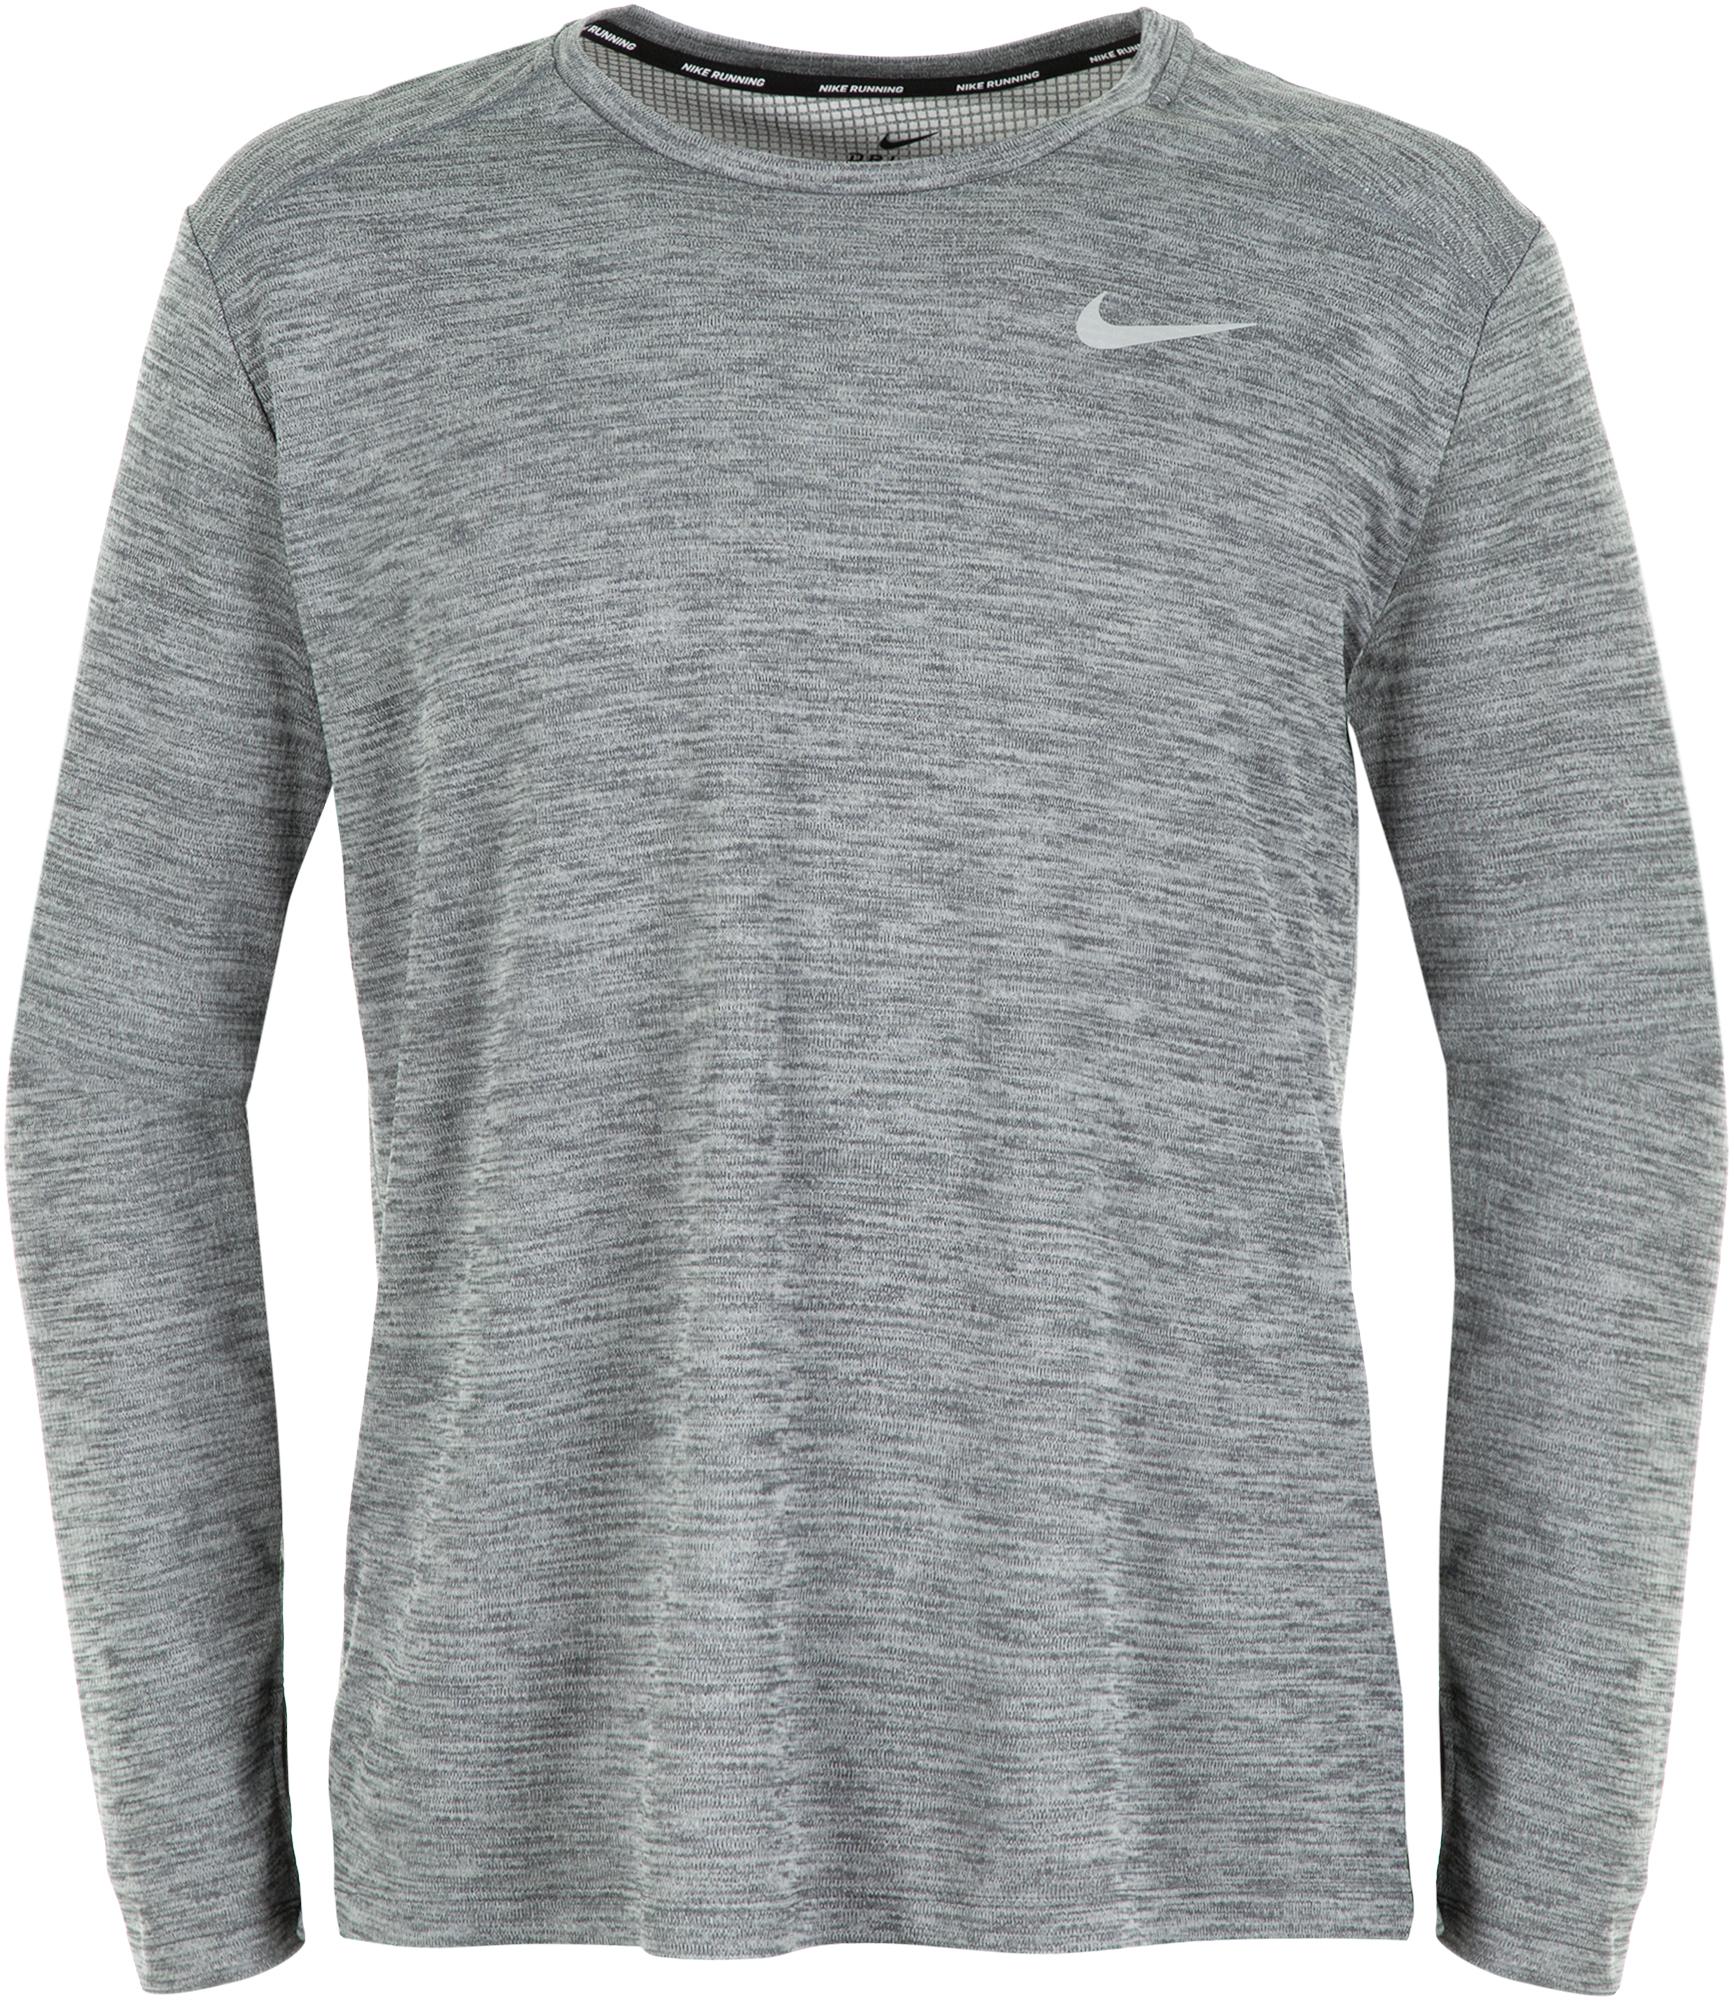 Nike Лонгслив мужской Nike Pacer, размер 46-48 лонгслив мужской oodji basic цвет серый 5b511002m 46737n 2300m размер s 46 48